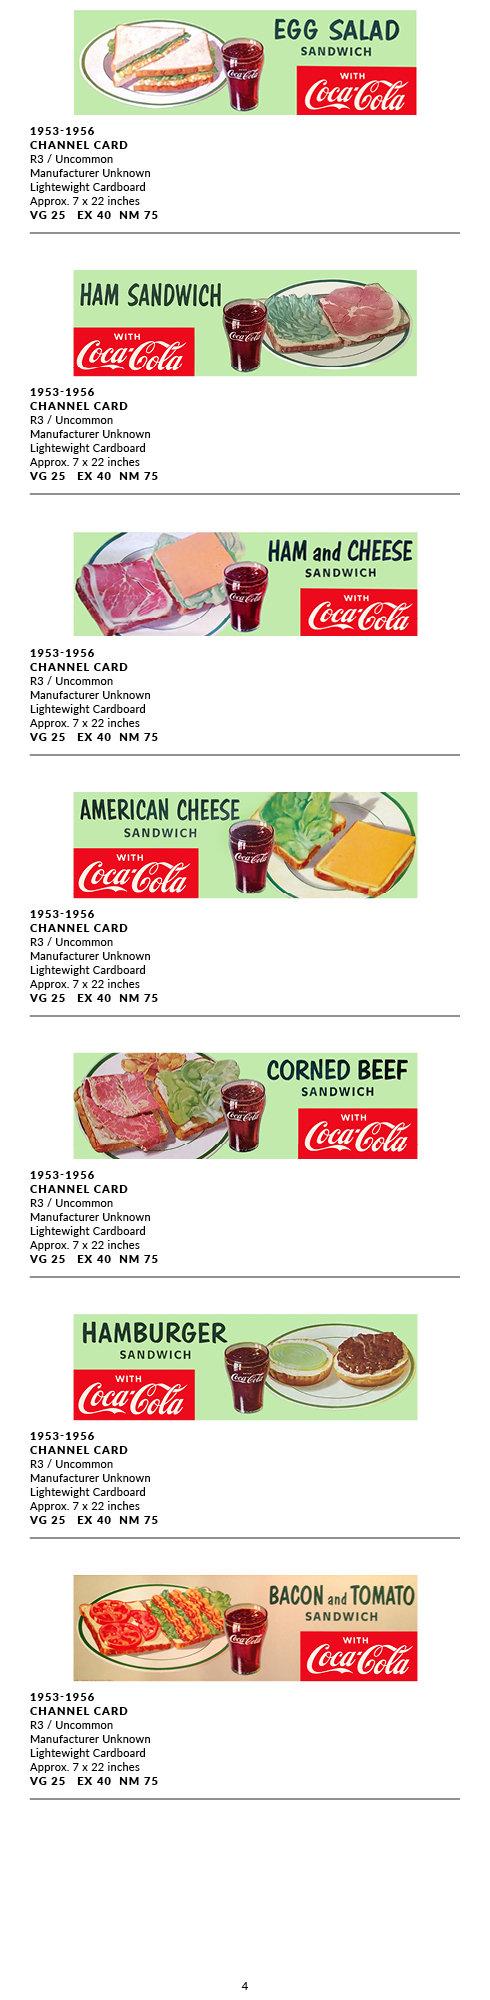 Food Channel Card4.jpg